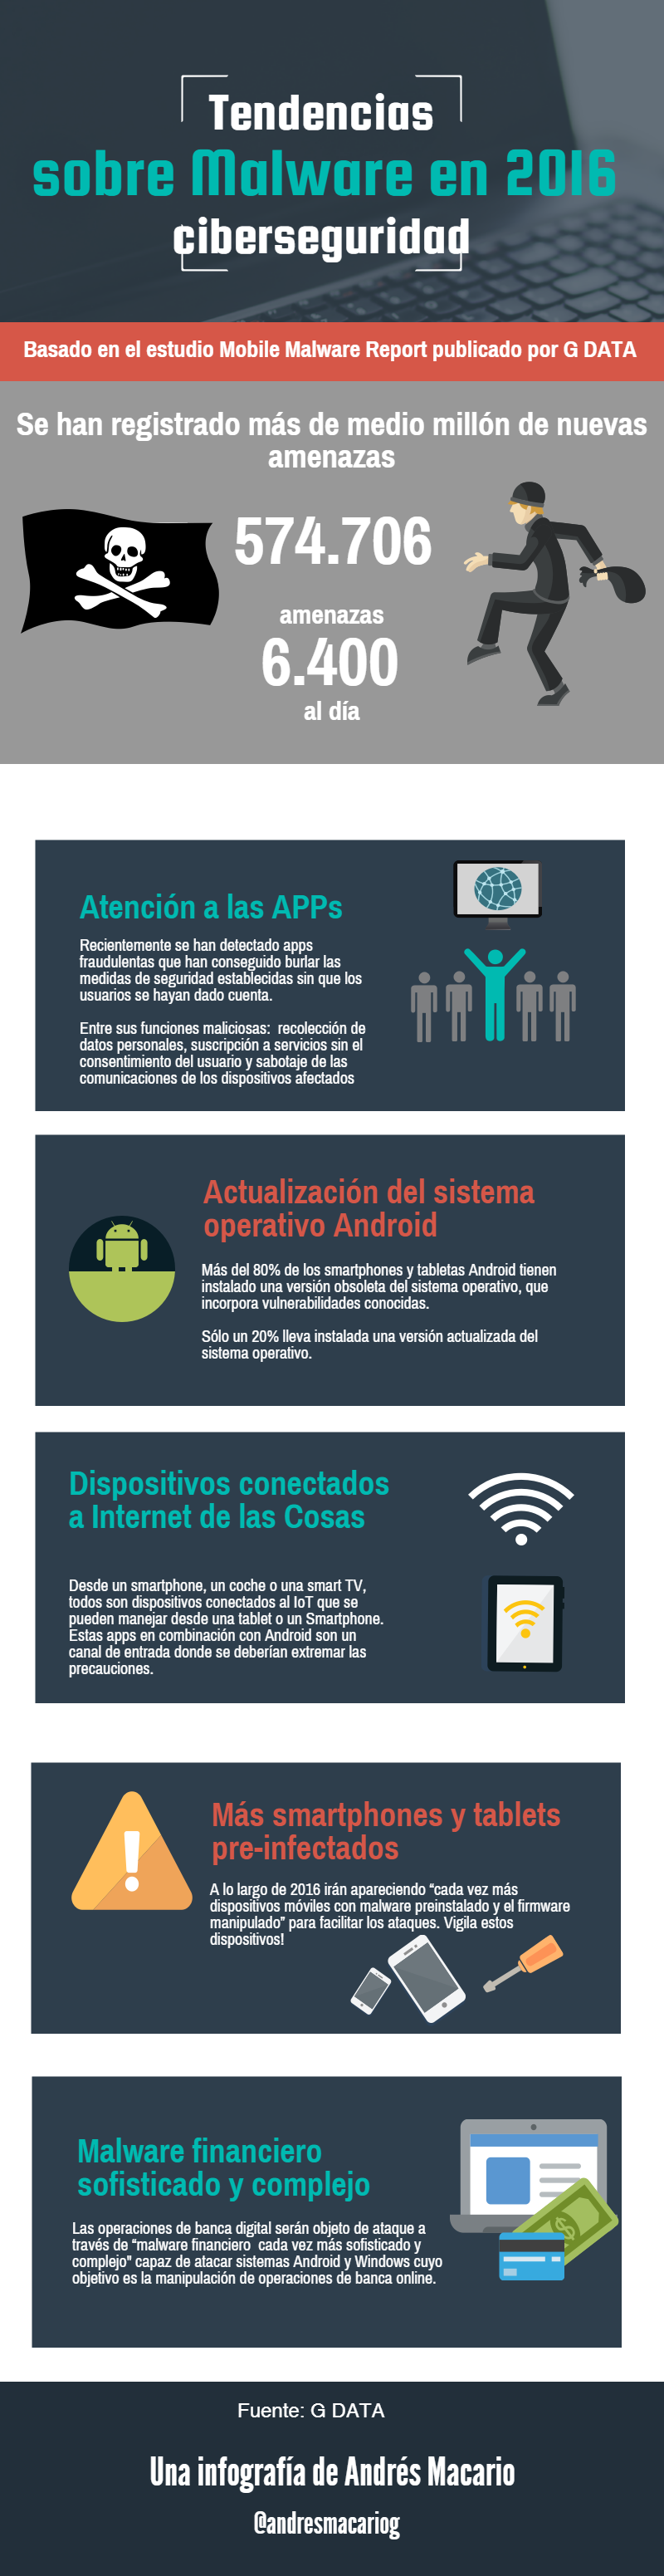 Tendencias-sobre-malware-infografia-Andres-Macario